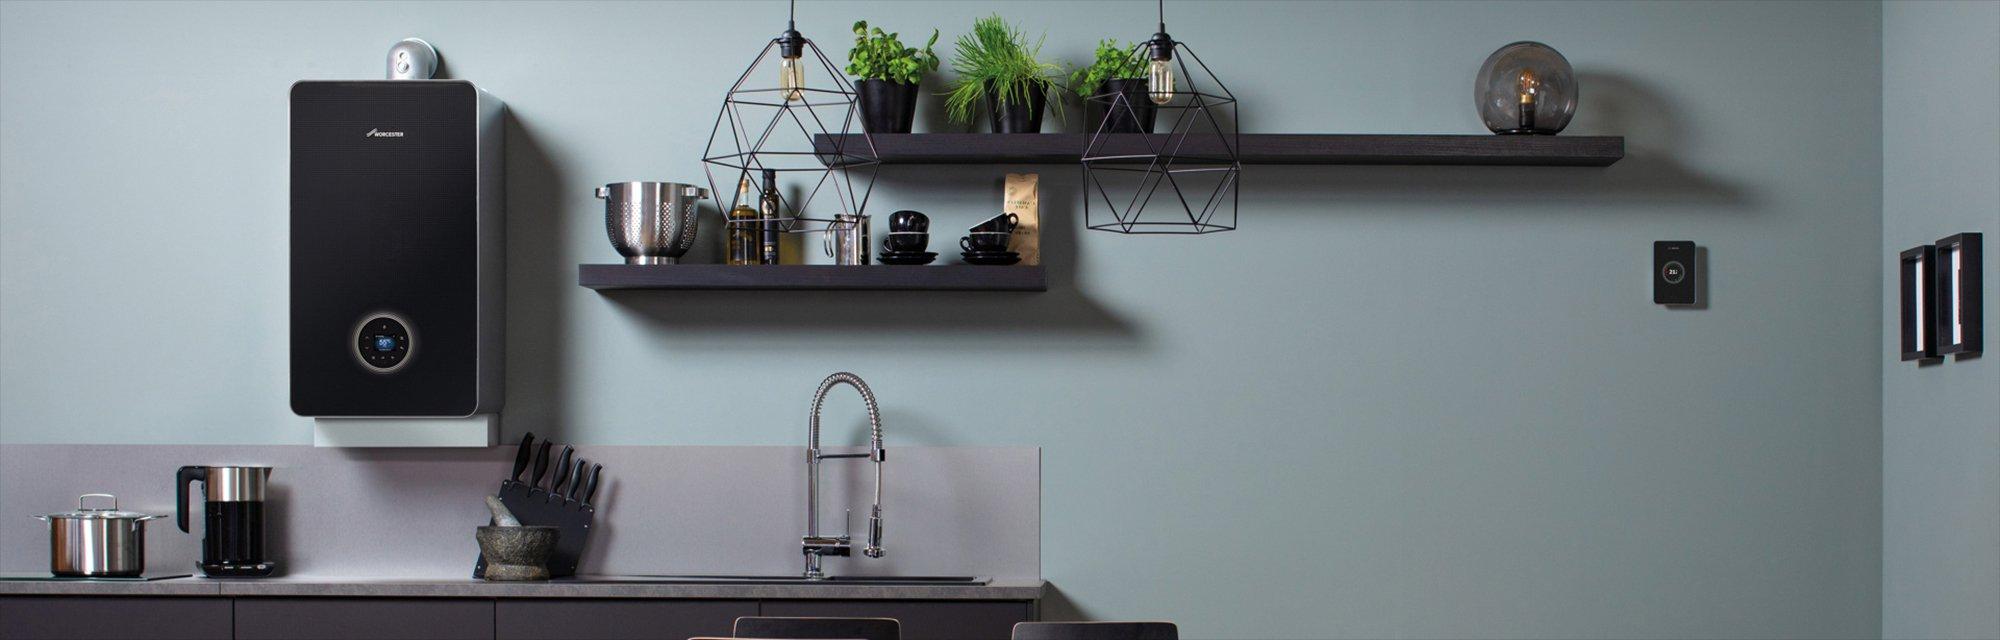 Heating Supplies / Plumbing Supplies Slough